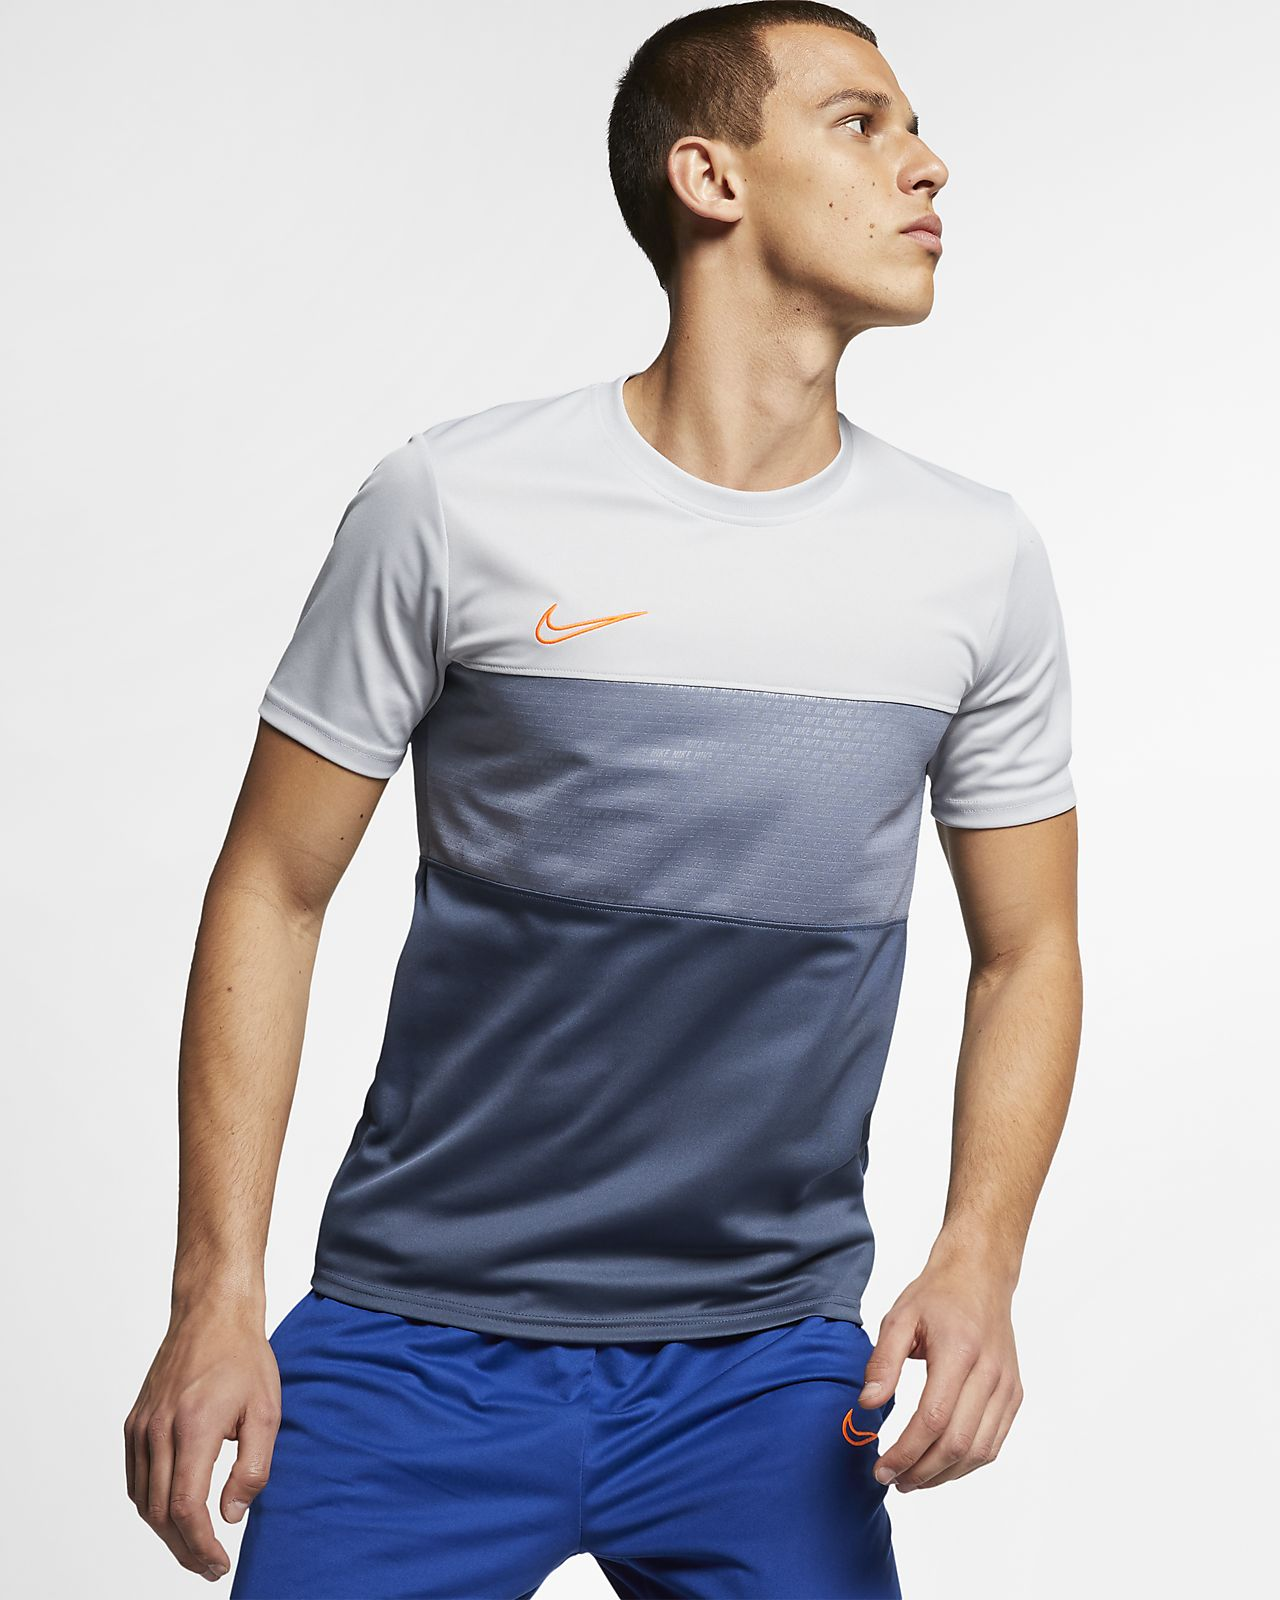 0f40a48d52c72 Maglia da calcio a manica corta Nike Dri-FIT Academy - Uomo. Nike.com CH